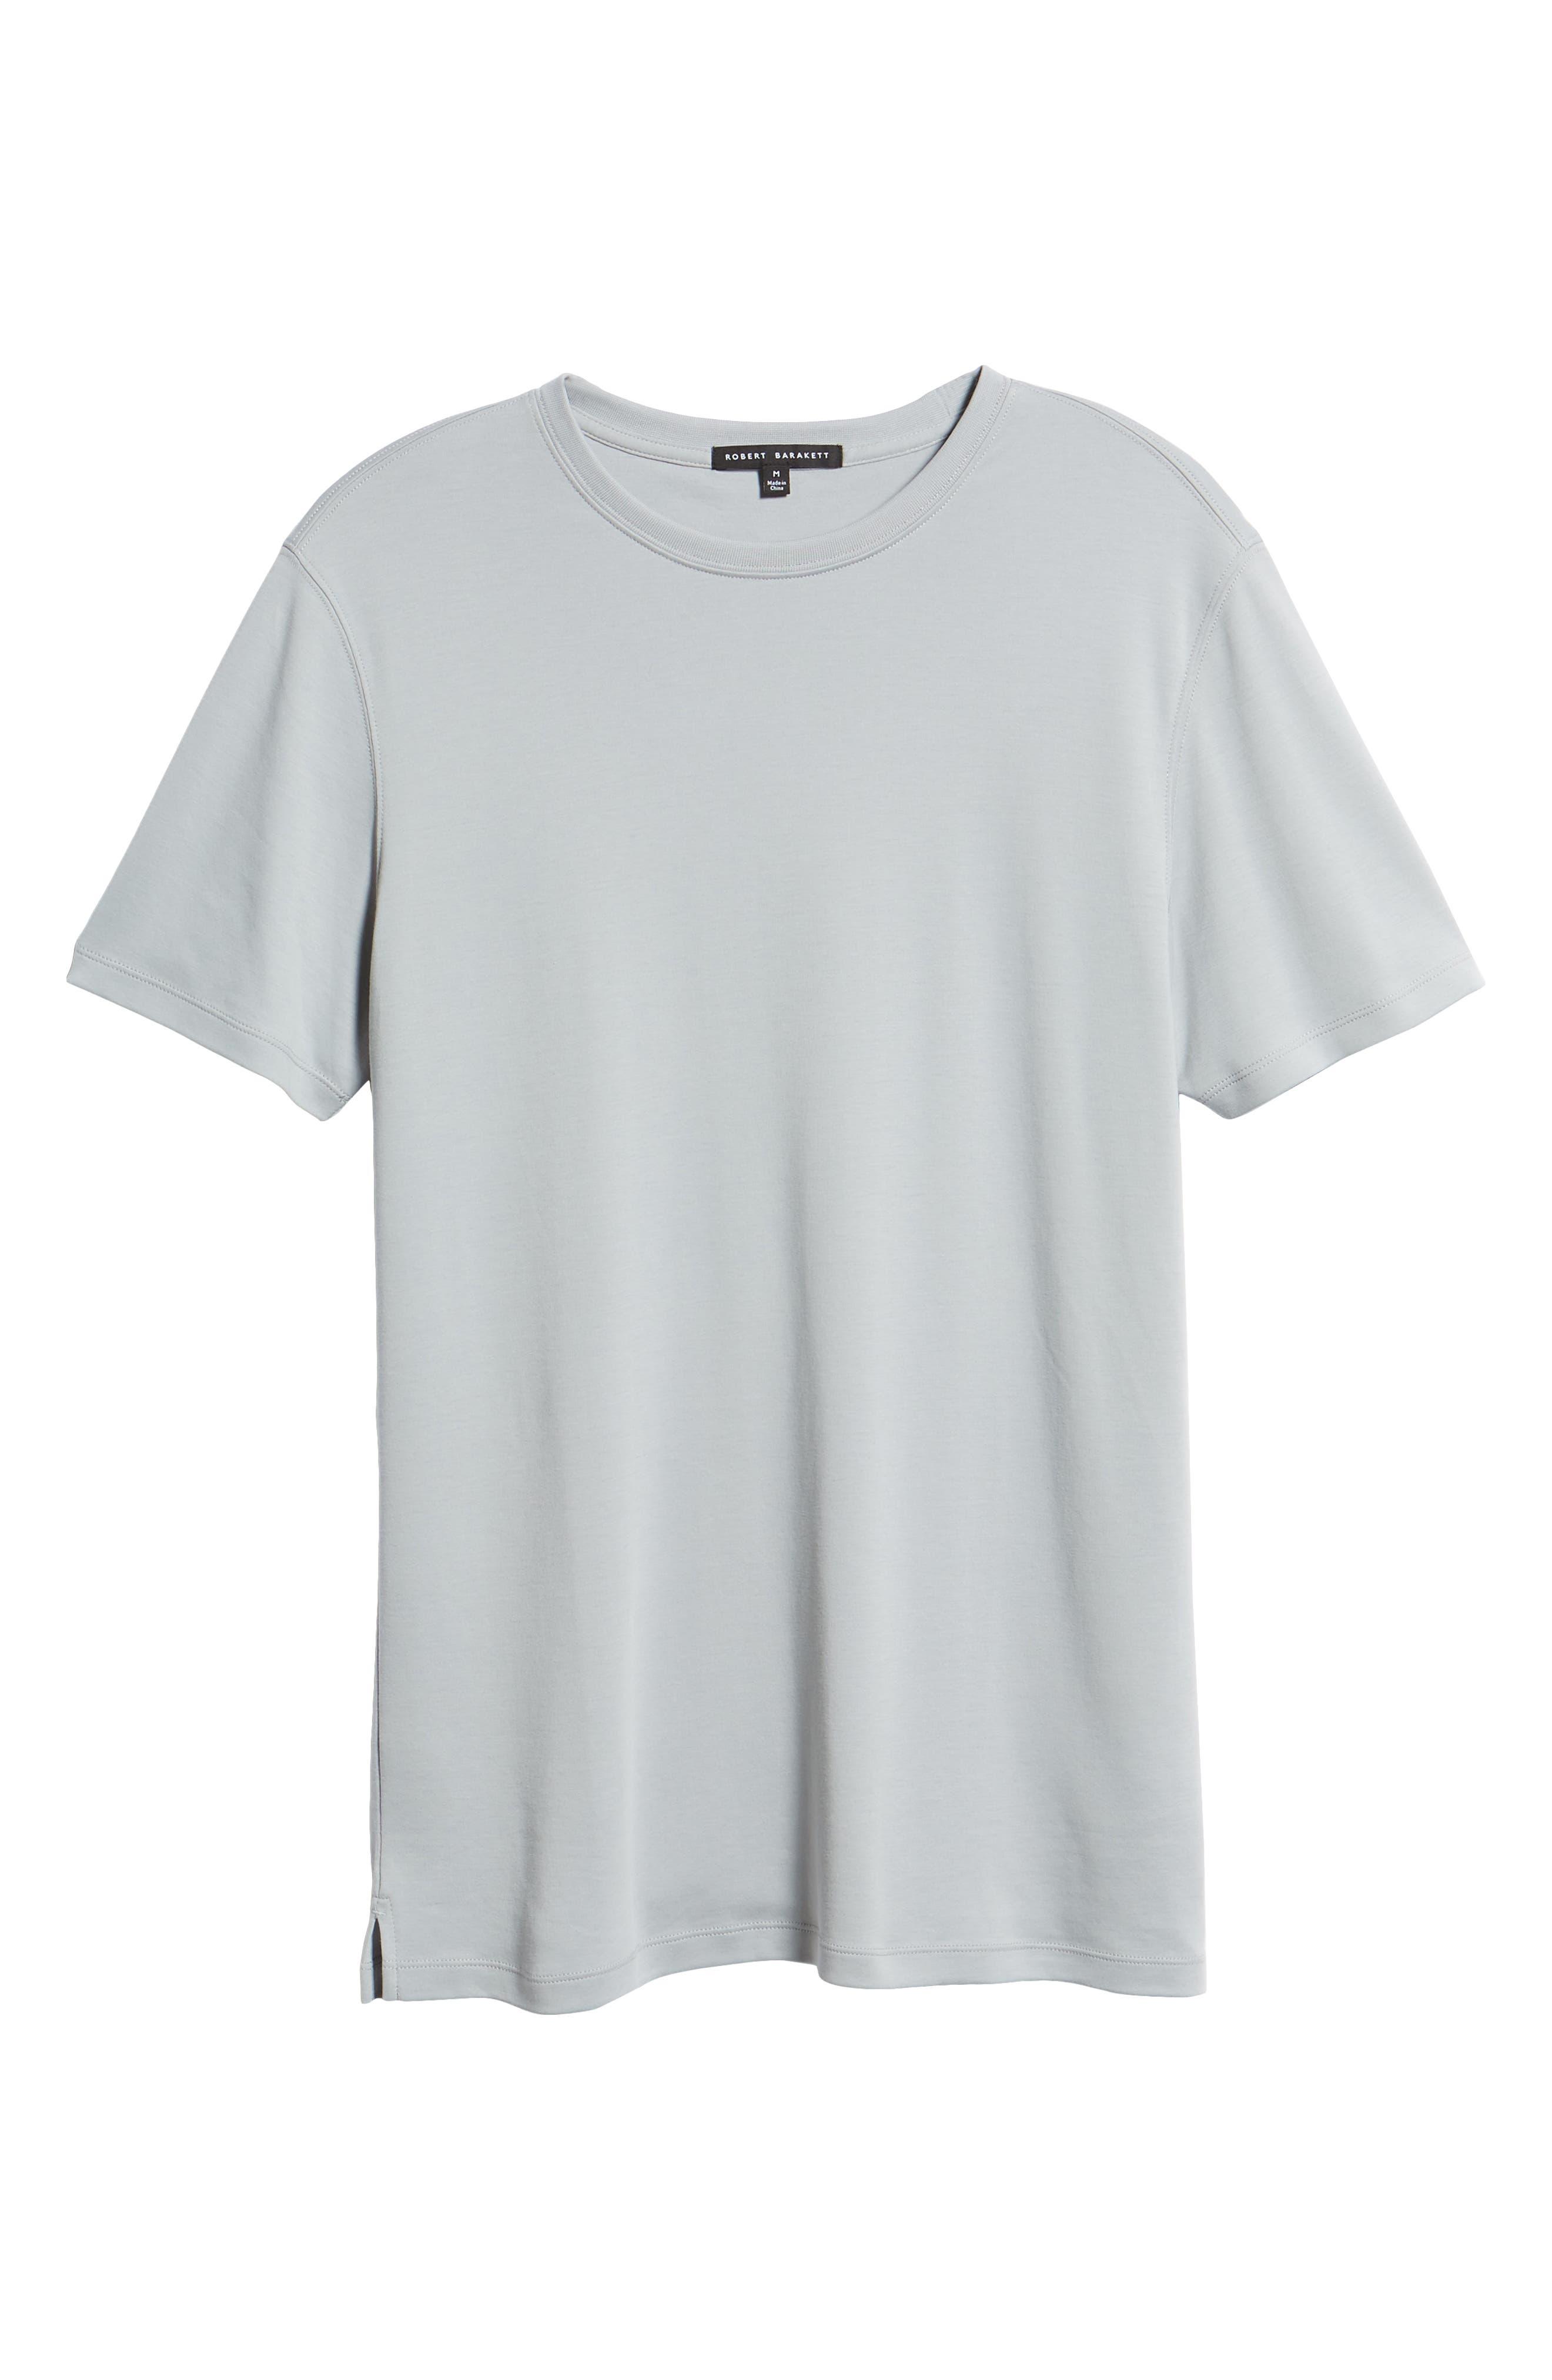 ROBERT BARAKETT,                             'Georgia' Crewneck T-Shirt,                             Alternate thumbnail 6, color,                             MOON DUST